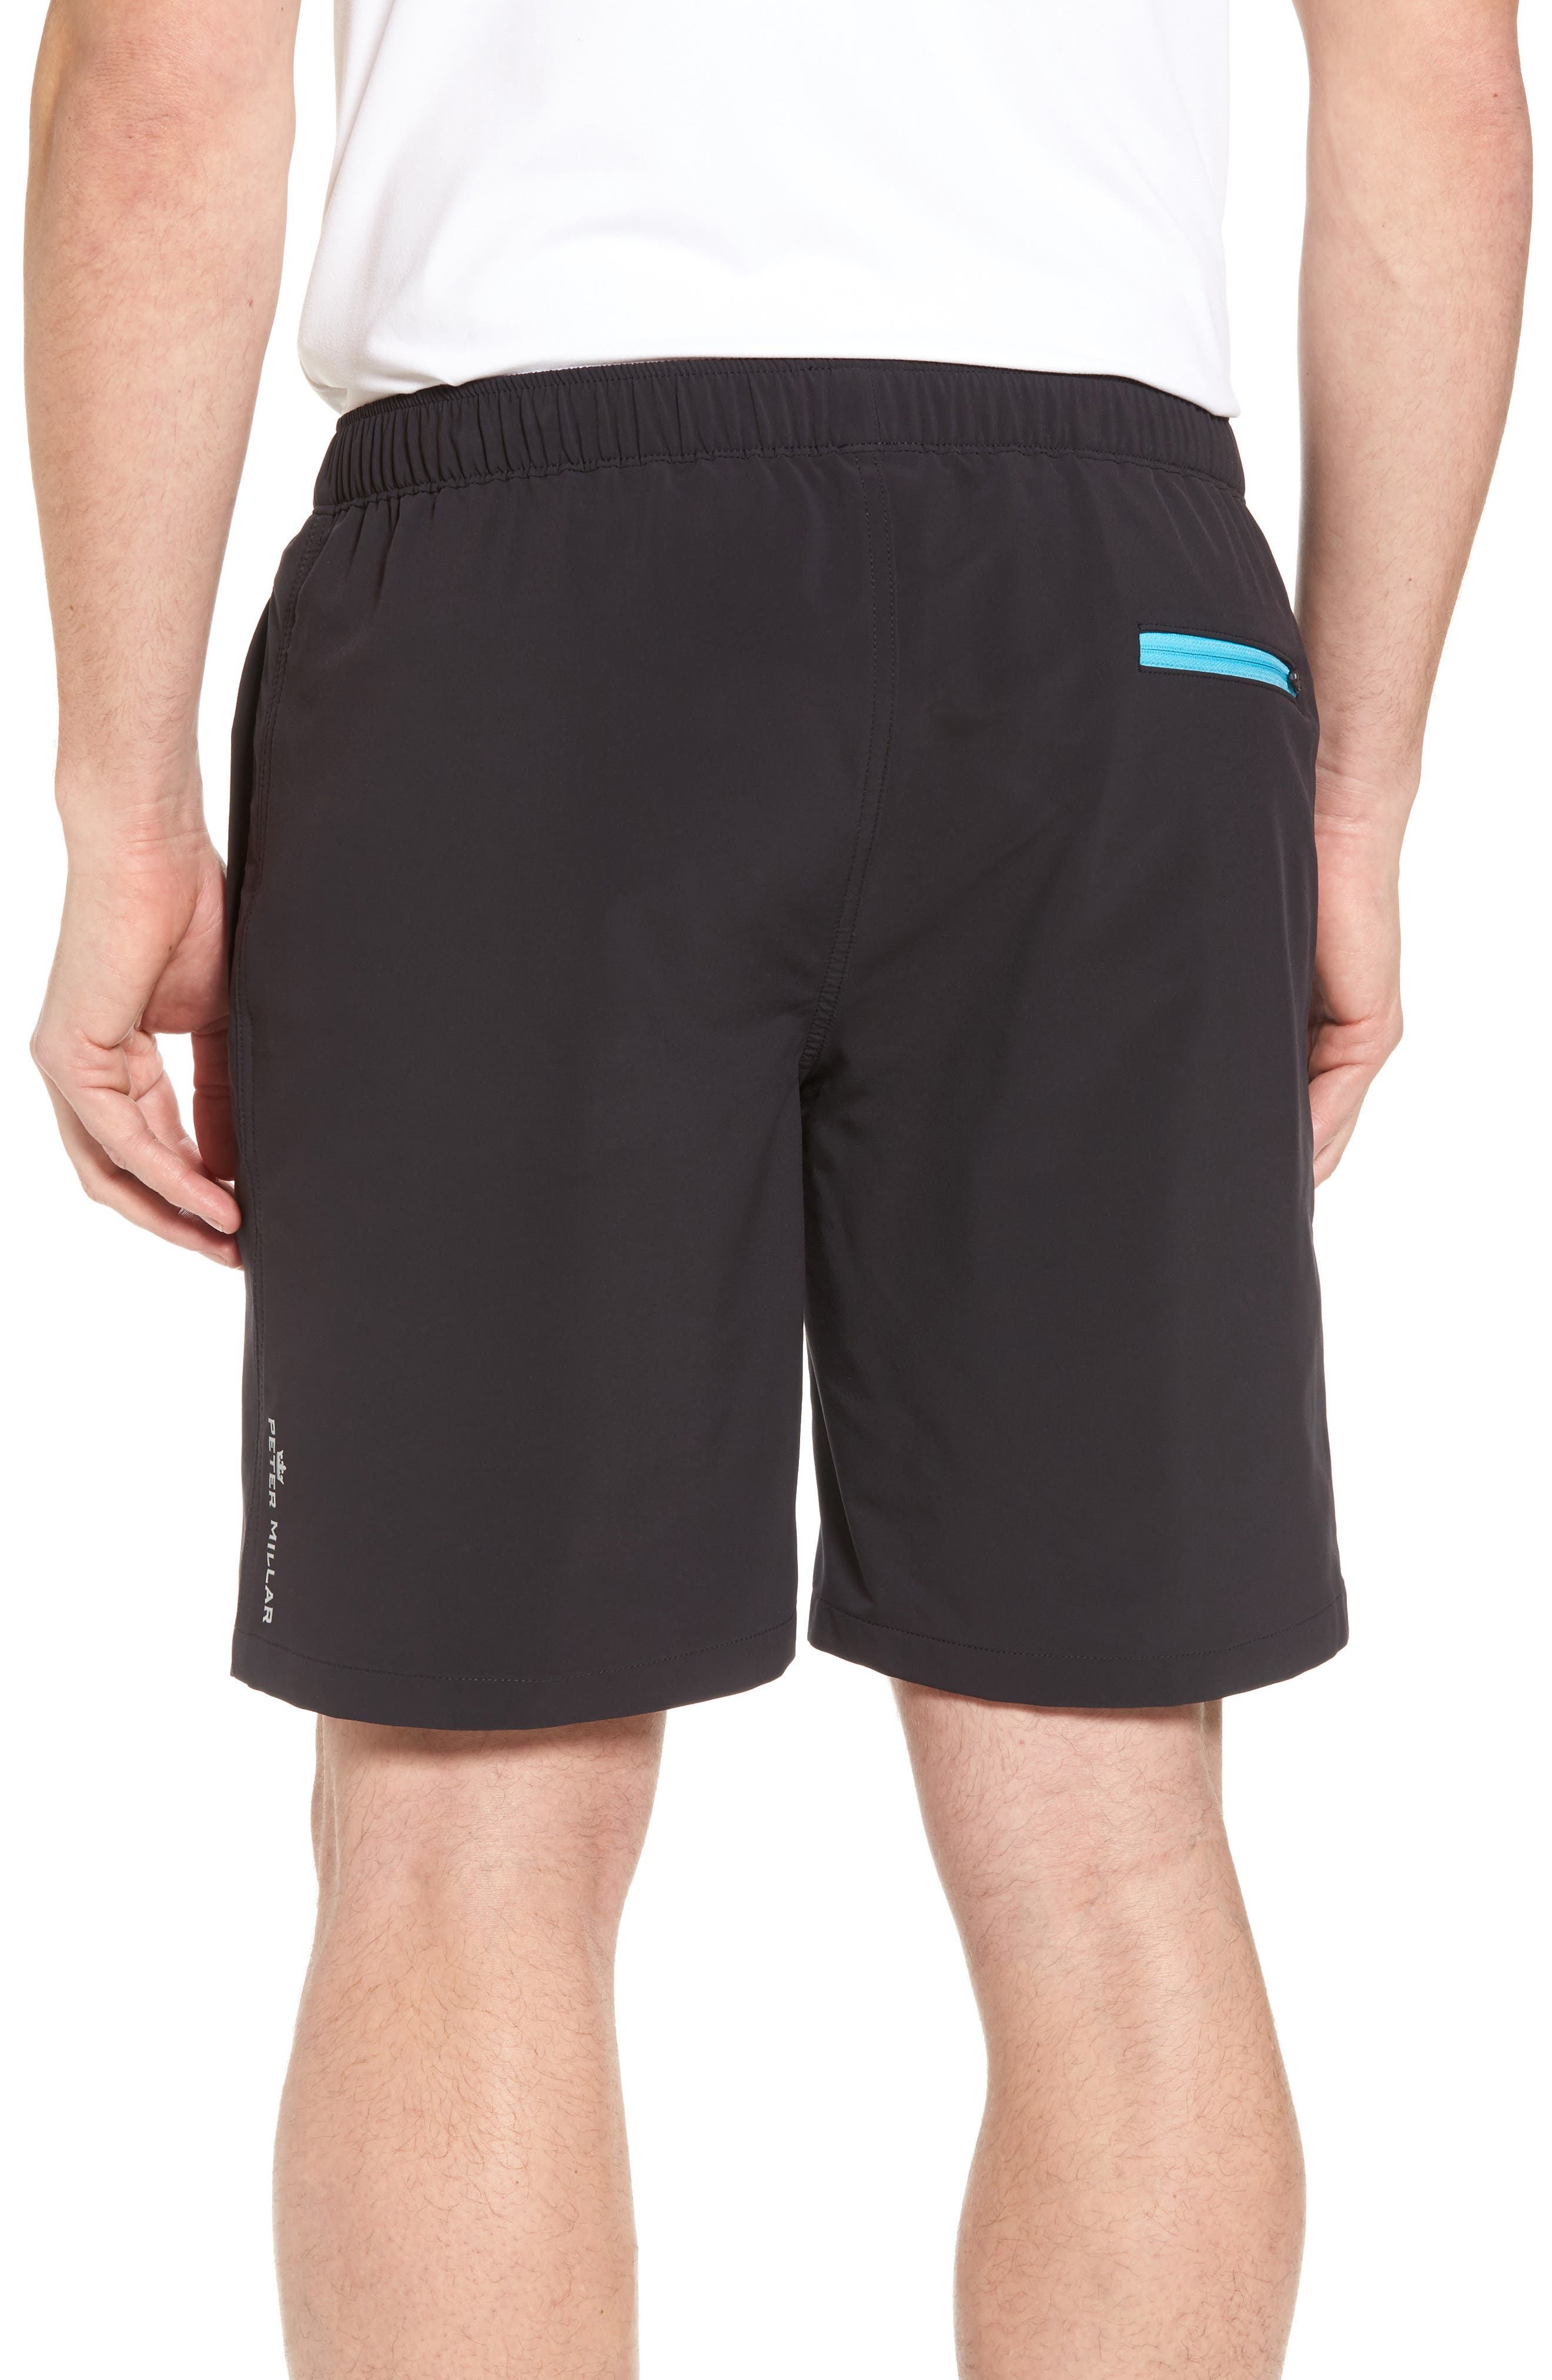 Oslo Sport Shorts,                             Alternate thumbnail 2, color,                             Black